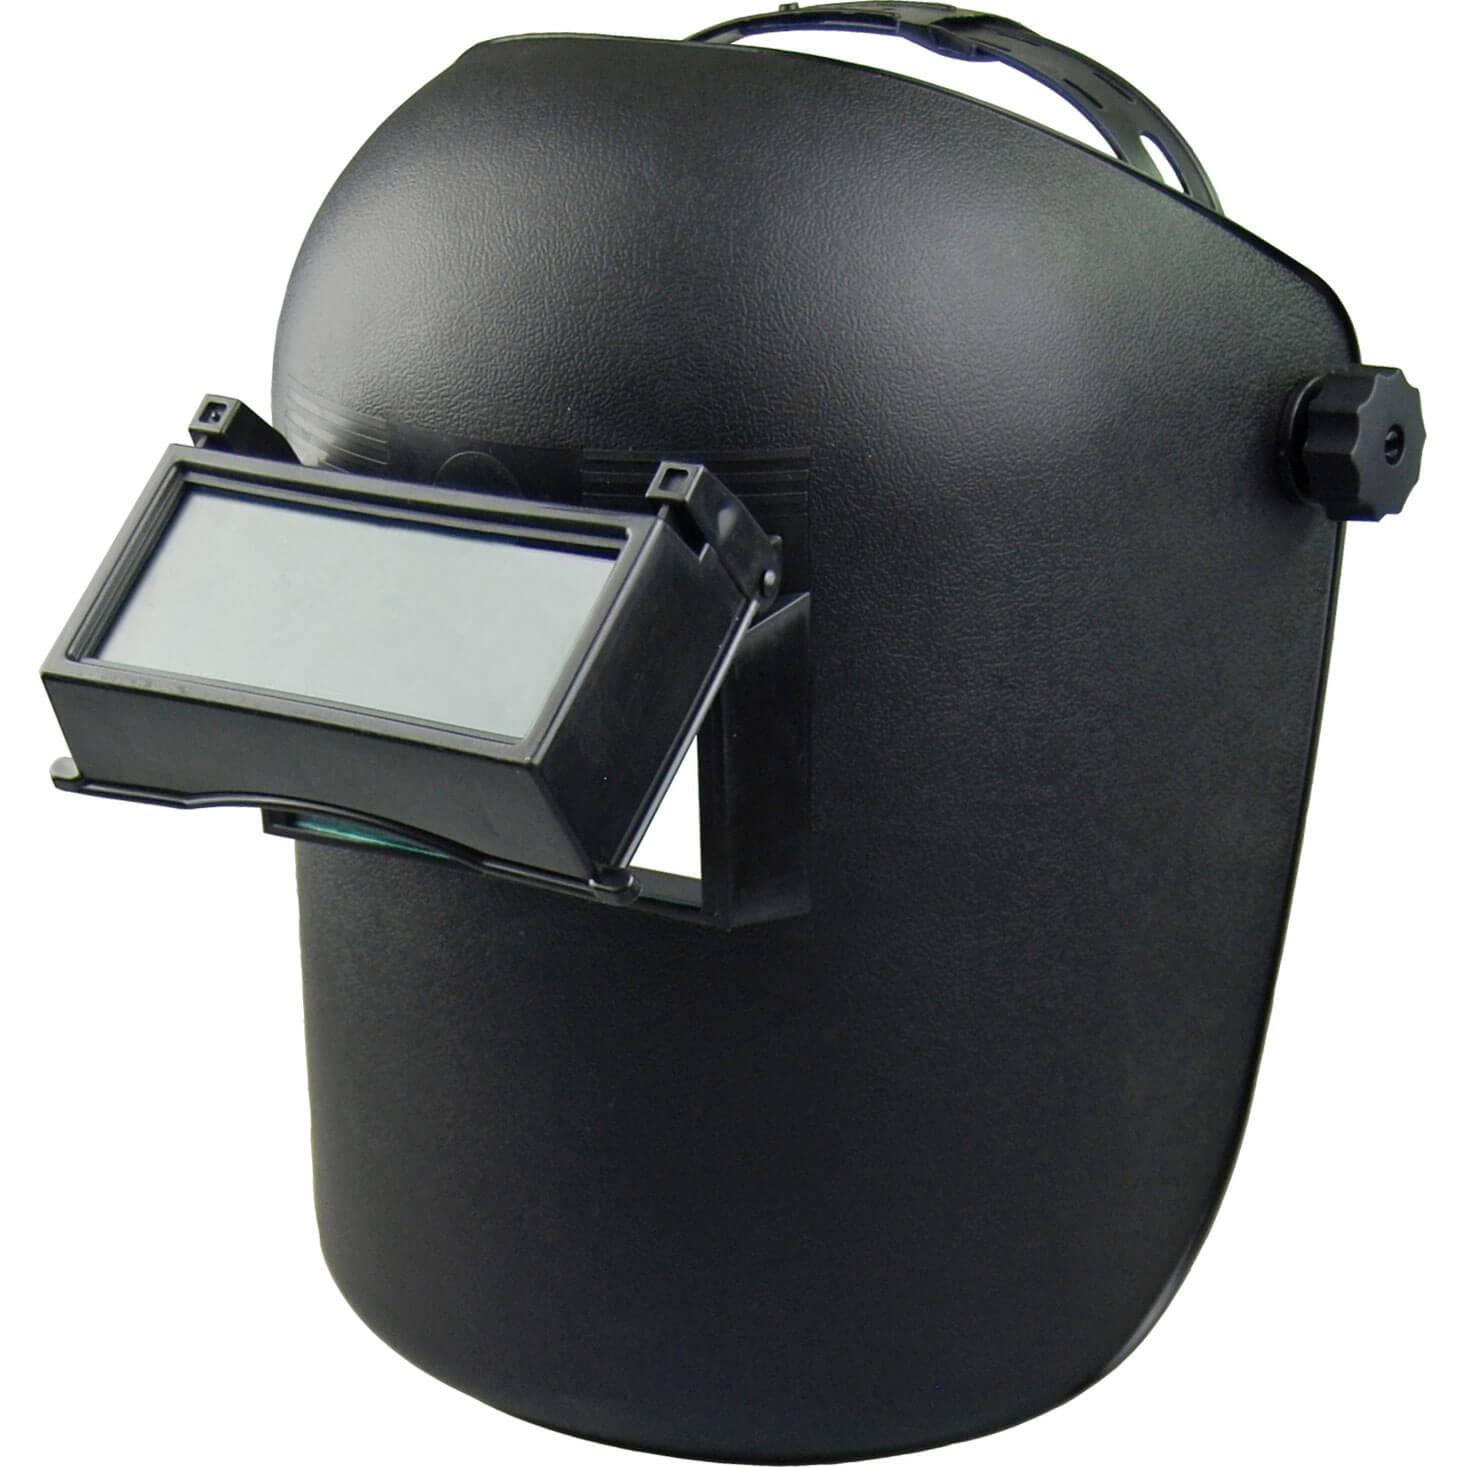 Photo of Scan flip up lens welding mask